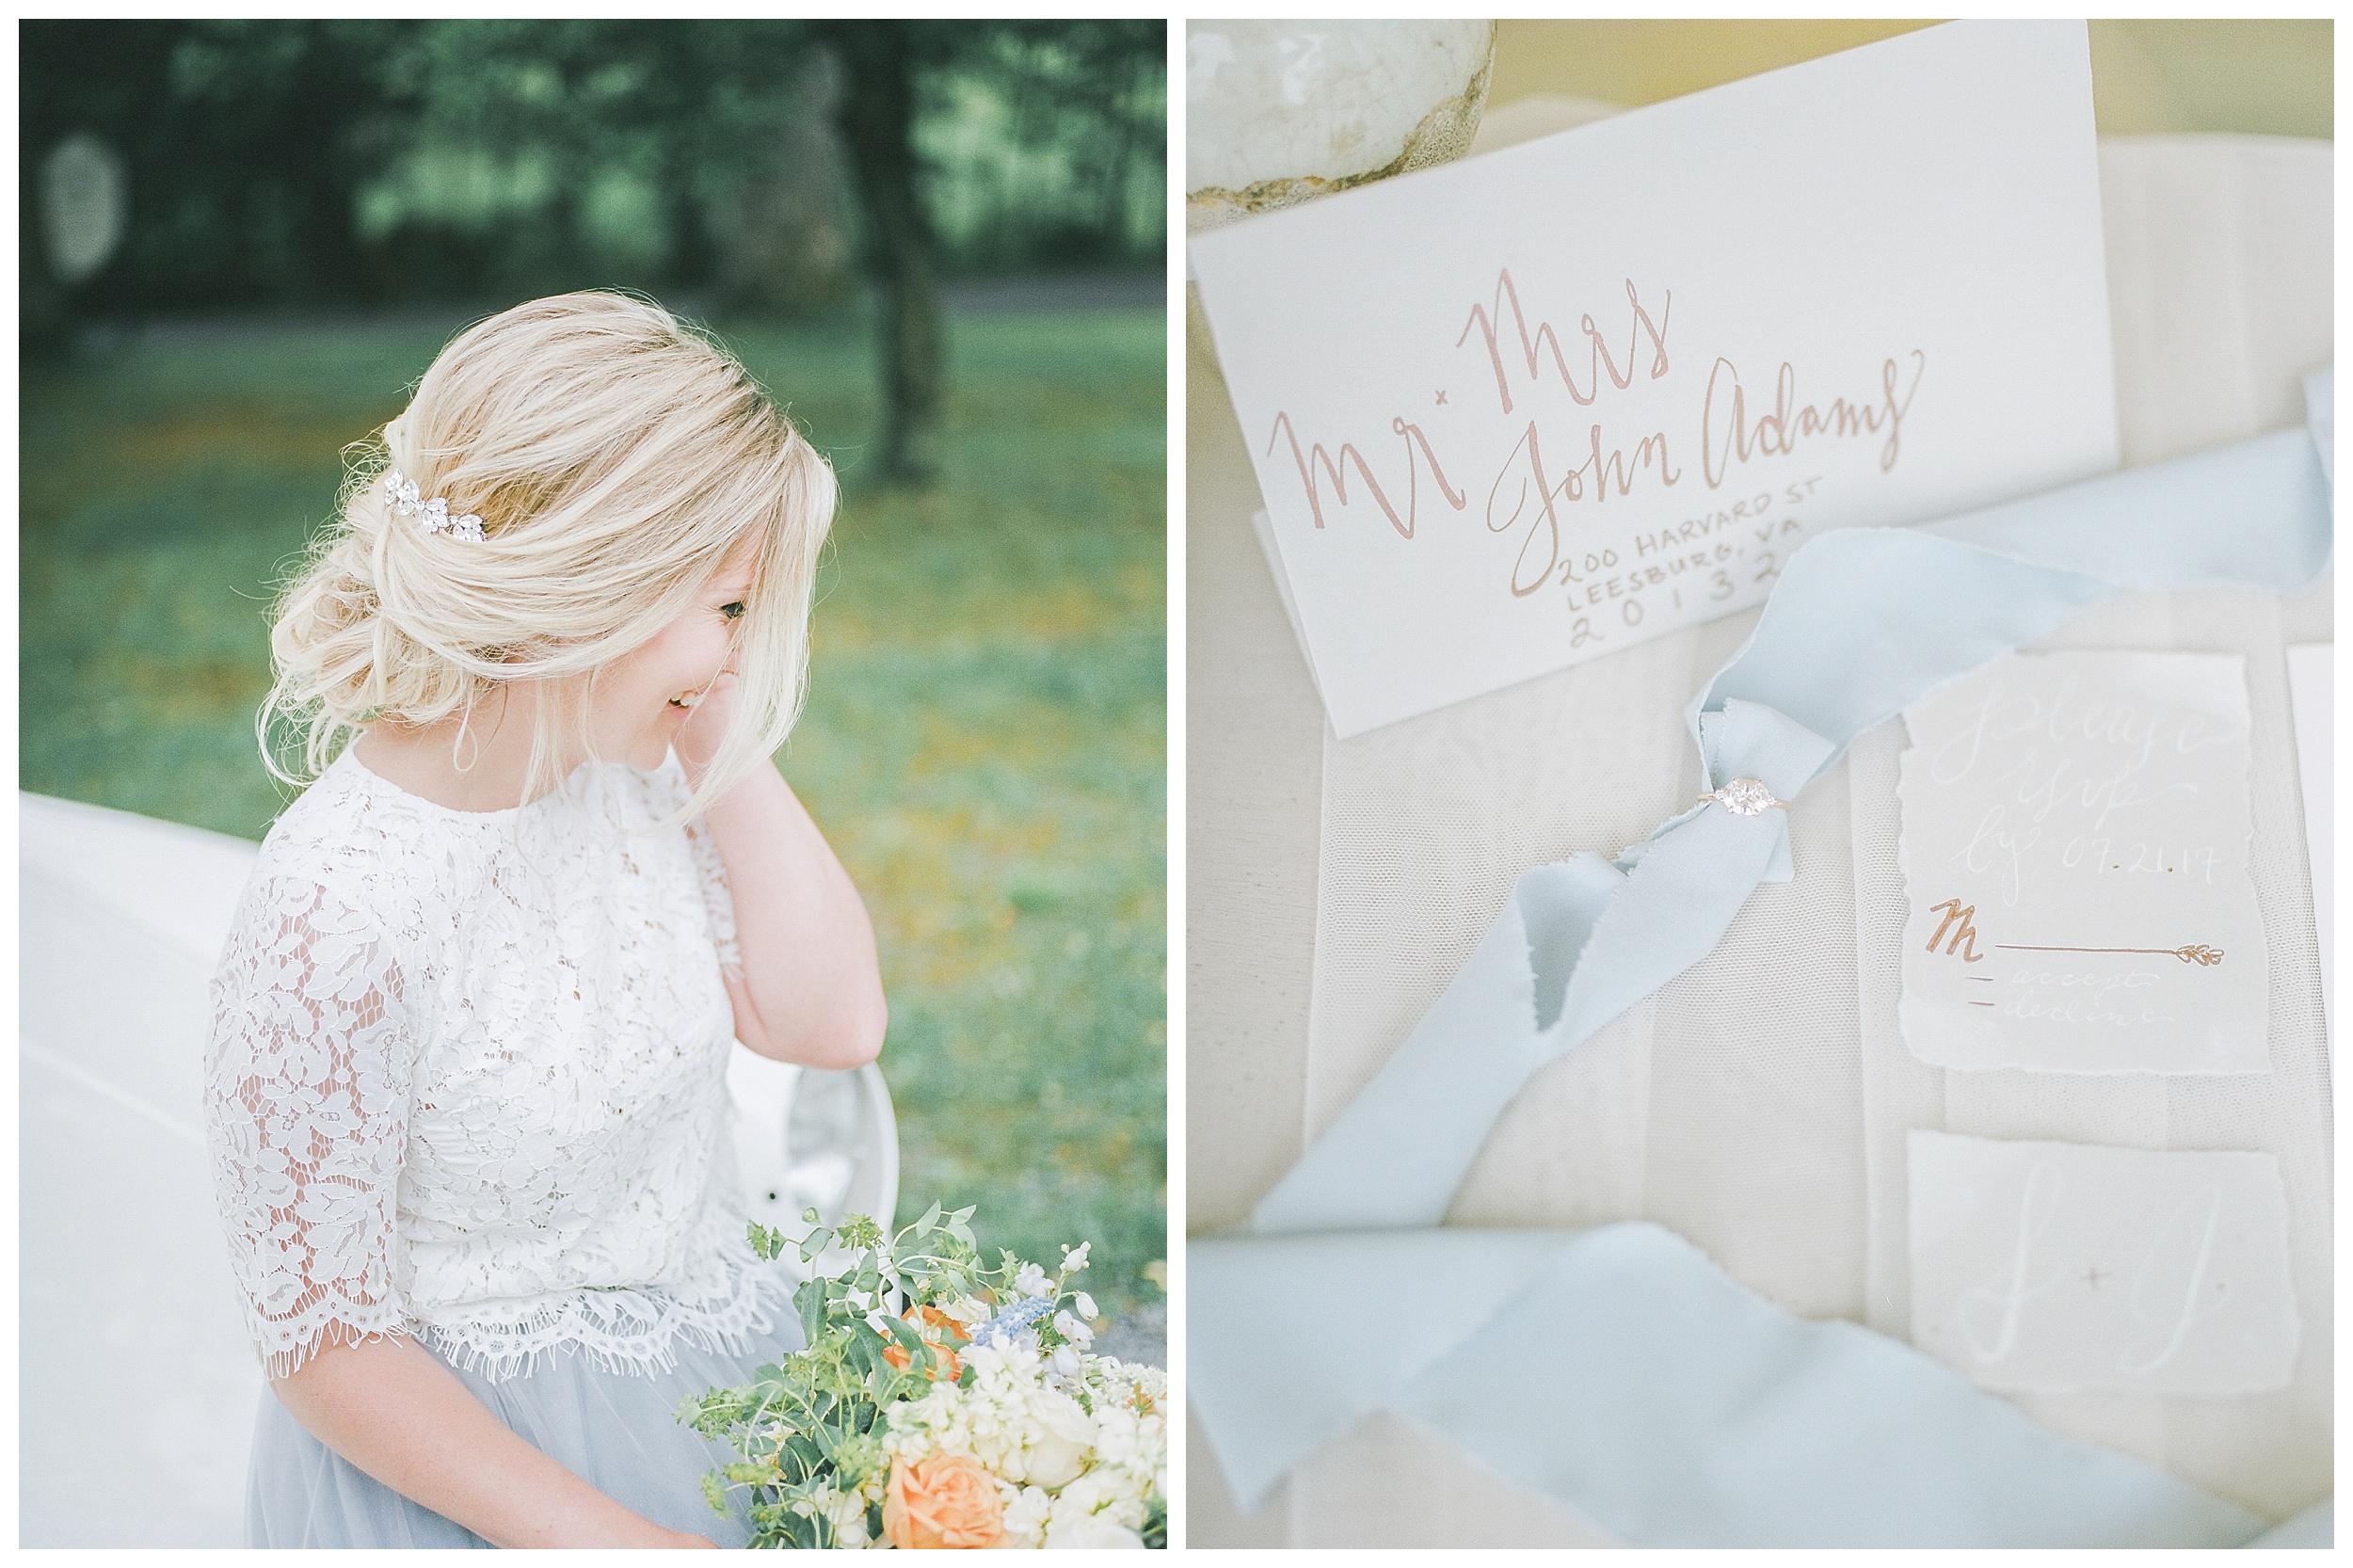 Rust Manor Wedding   Virginia Wedding Photographer Kir Tuben_0002.jpg